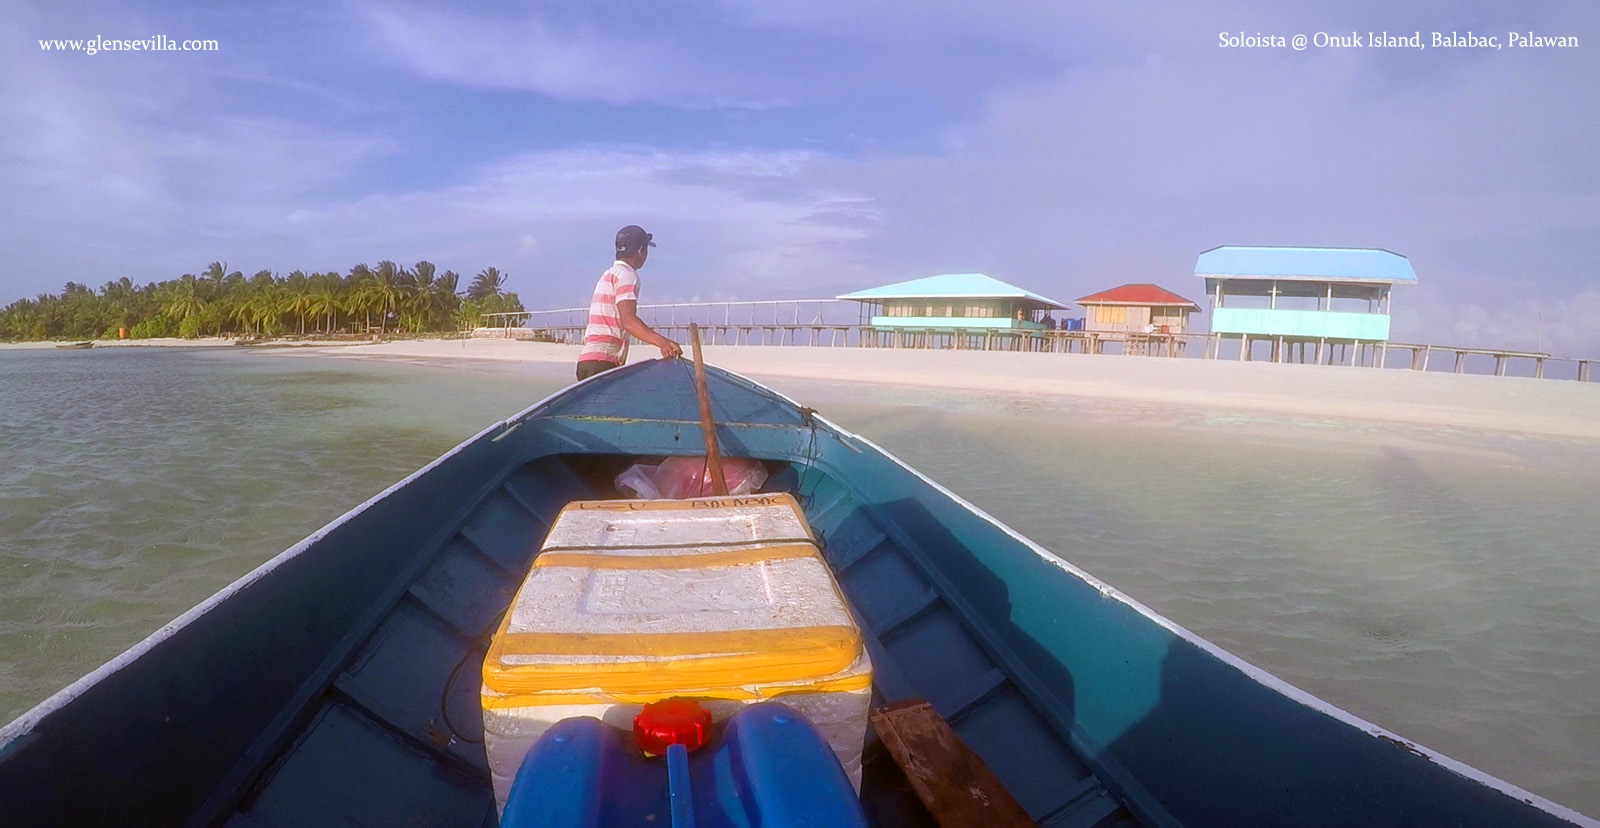 Onok Island Onuk Balabac Palawan